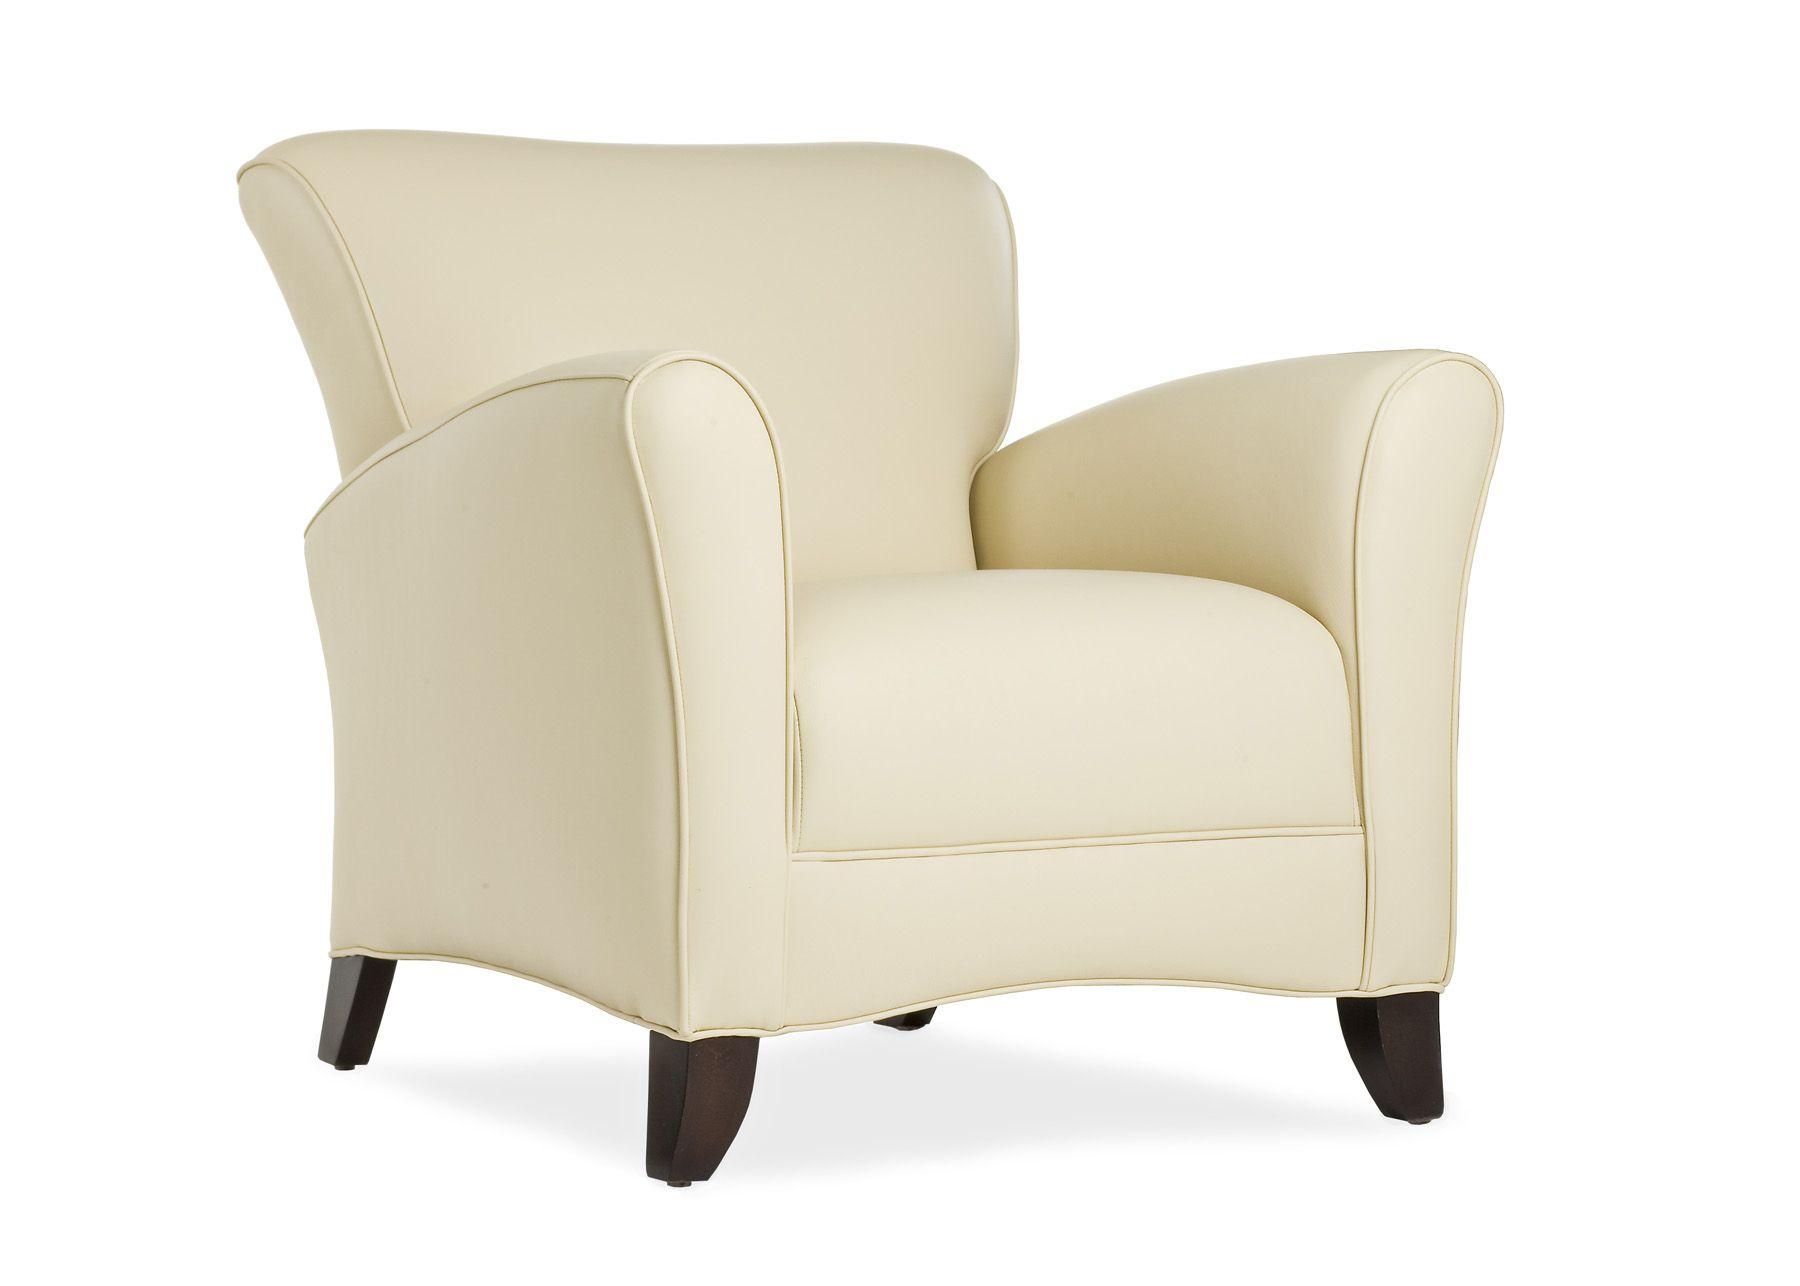 Cabot wrenn 1378 alisha lounge chair h34 w31 d33 inside